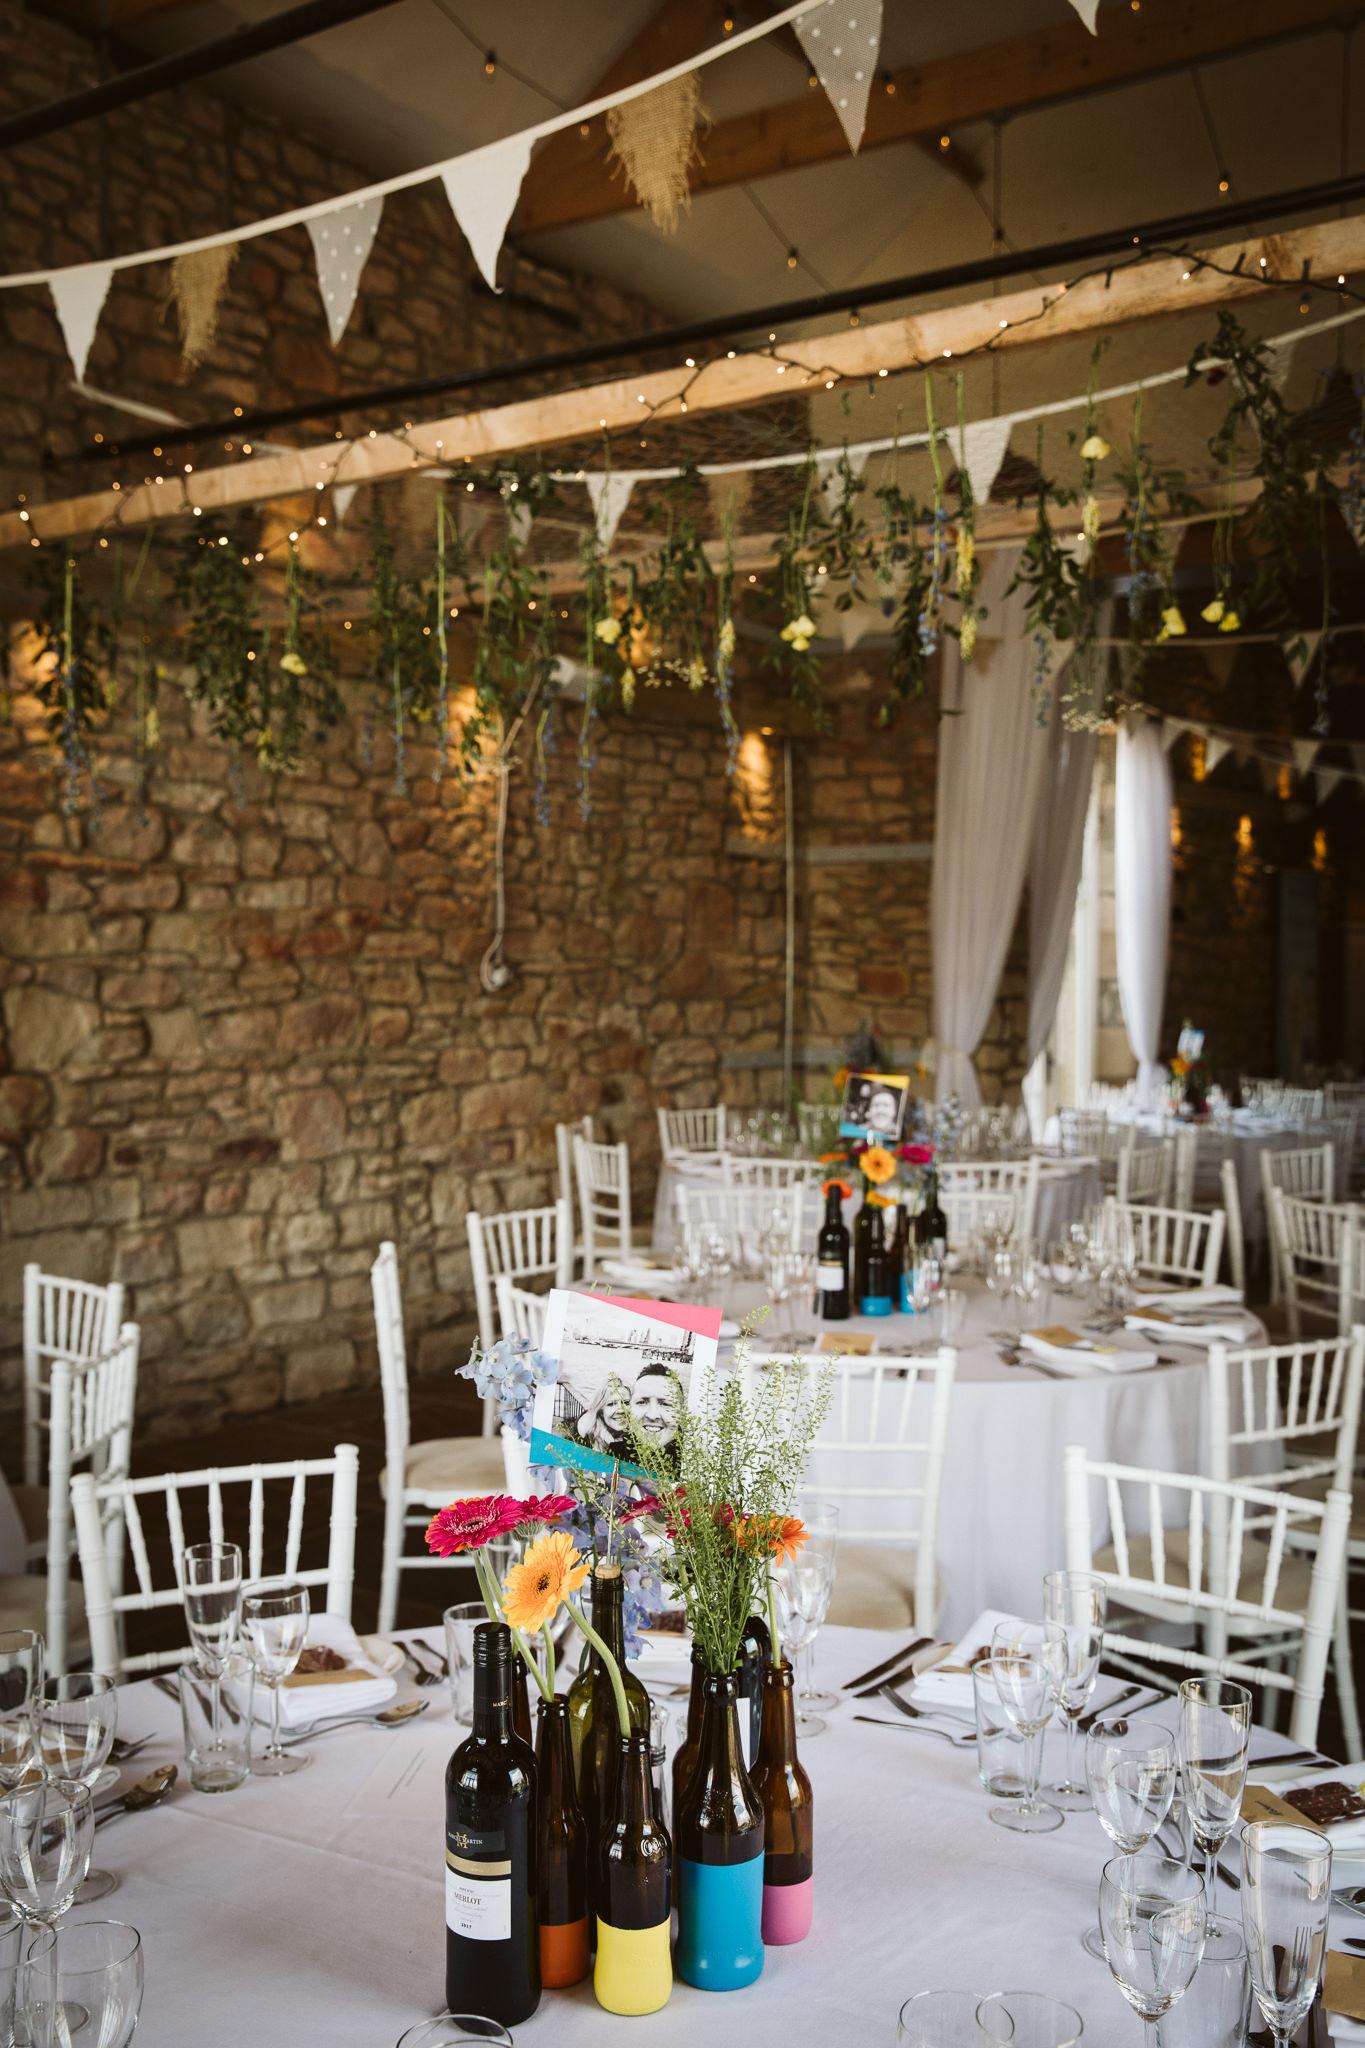 northside-farm-wedding-northumberland-margarita-hope (48).jpg